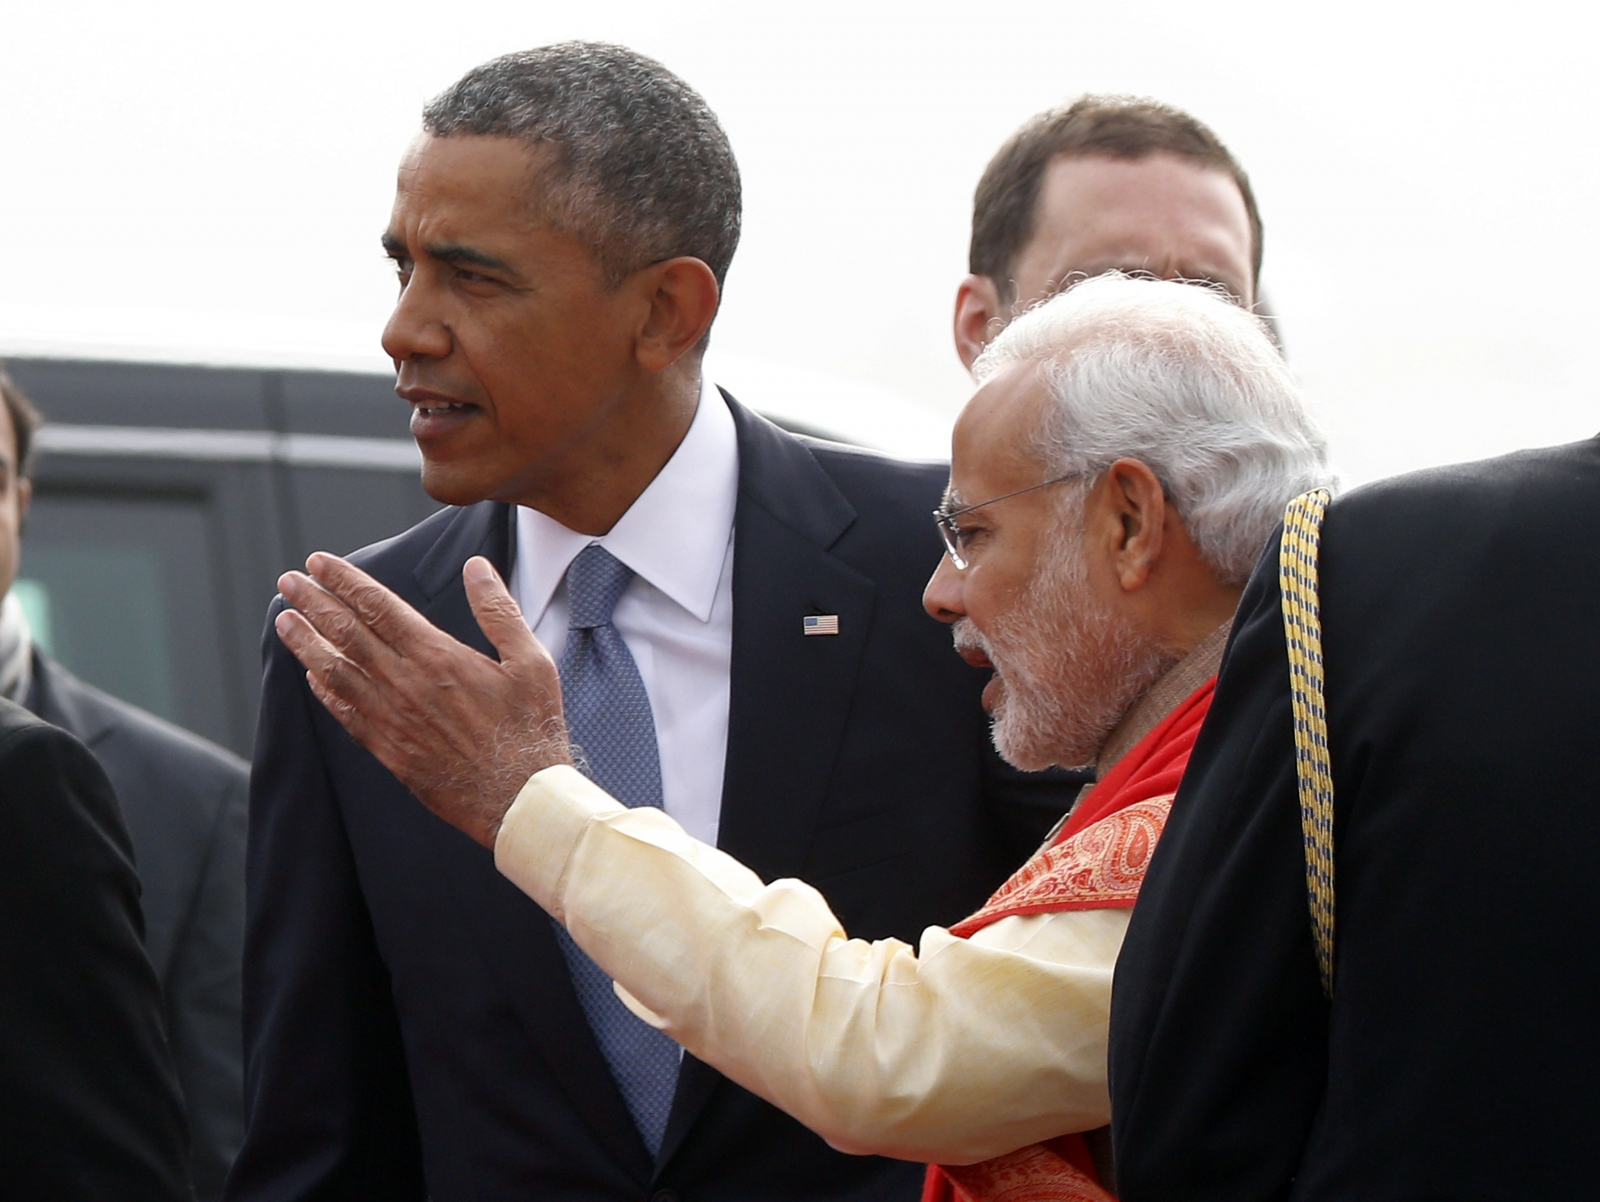 Obama lands in India